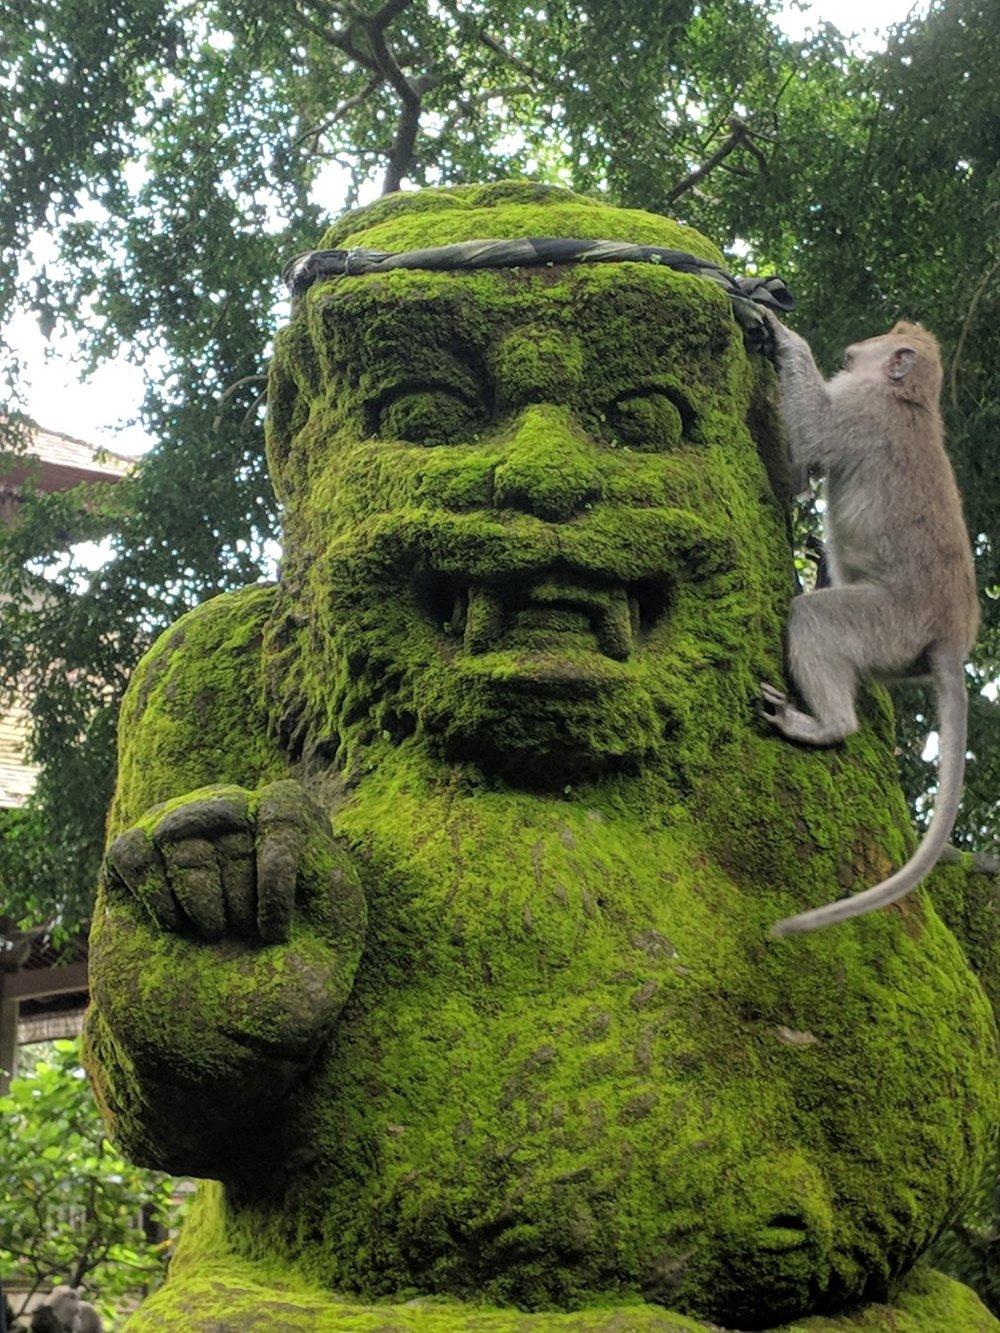 Monkeys crawl on Monkey statues in the Monkey Forest of Ubud, Bali. boldlygotravel.com